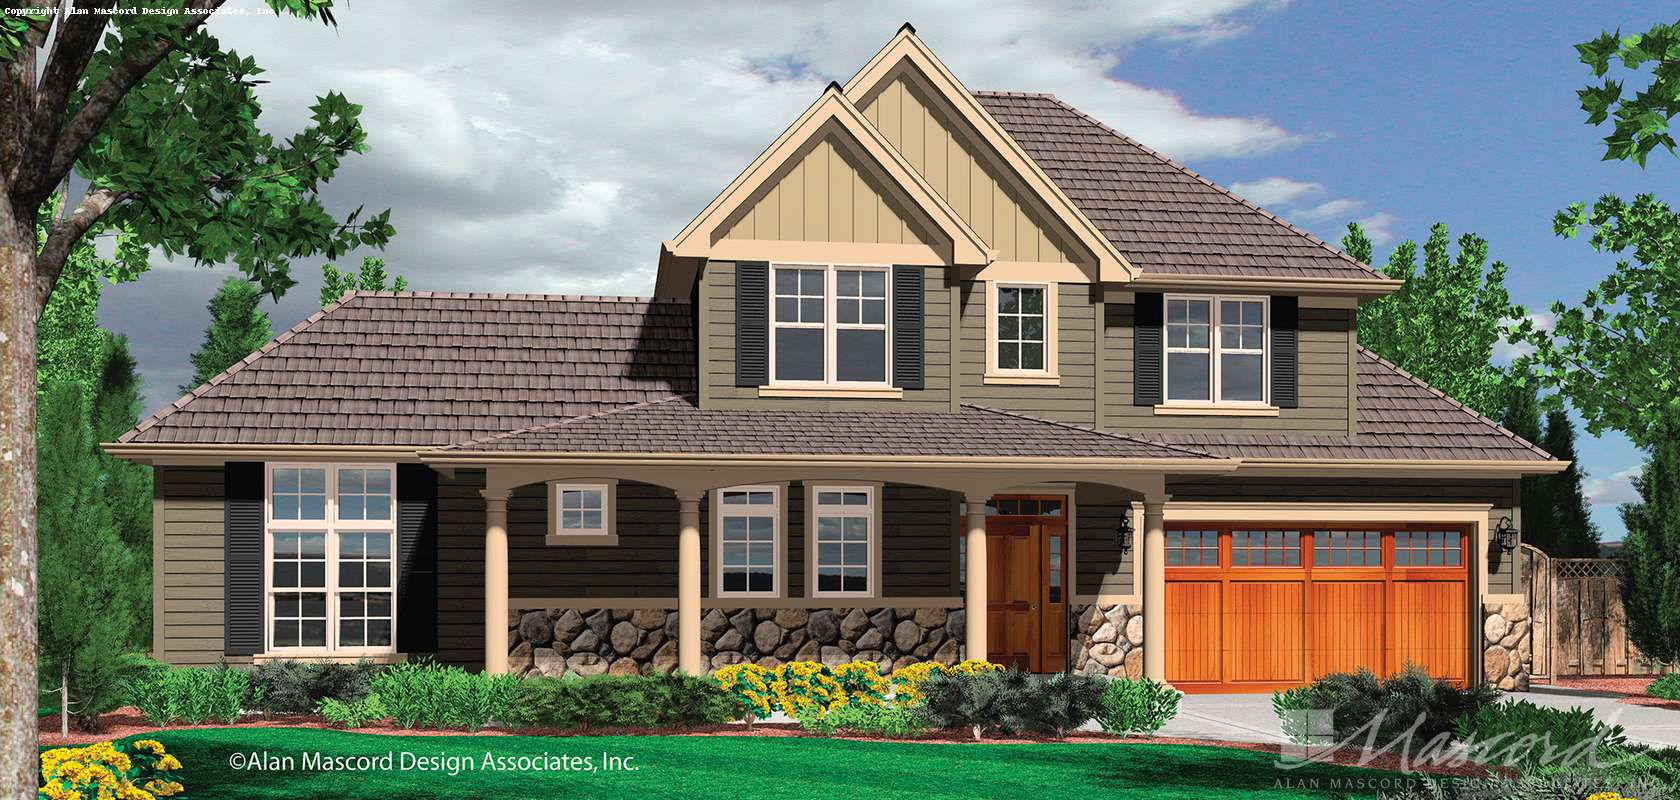 Mascord House Plan B21104A: The